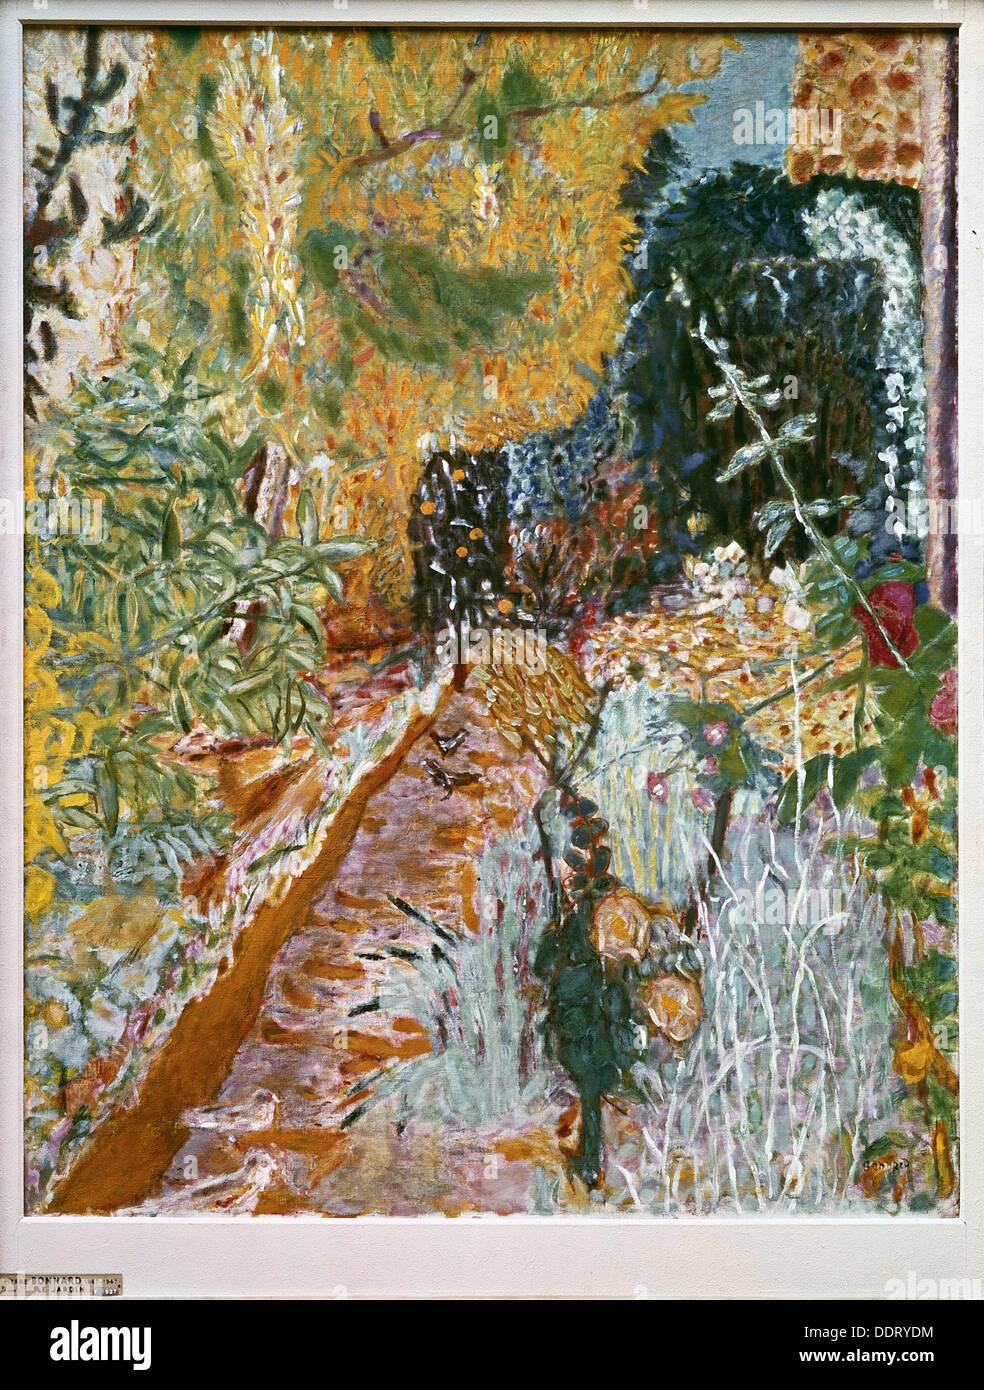 ´Le Jardin´, painting by Pierre Bonnard - Stock Image